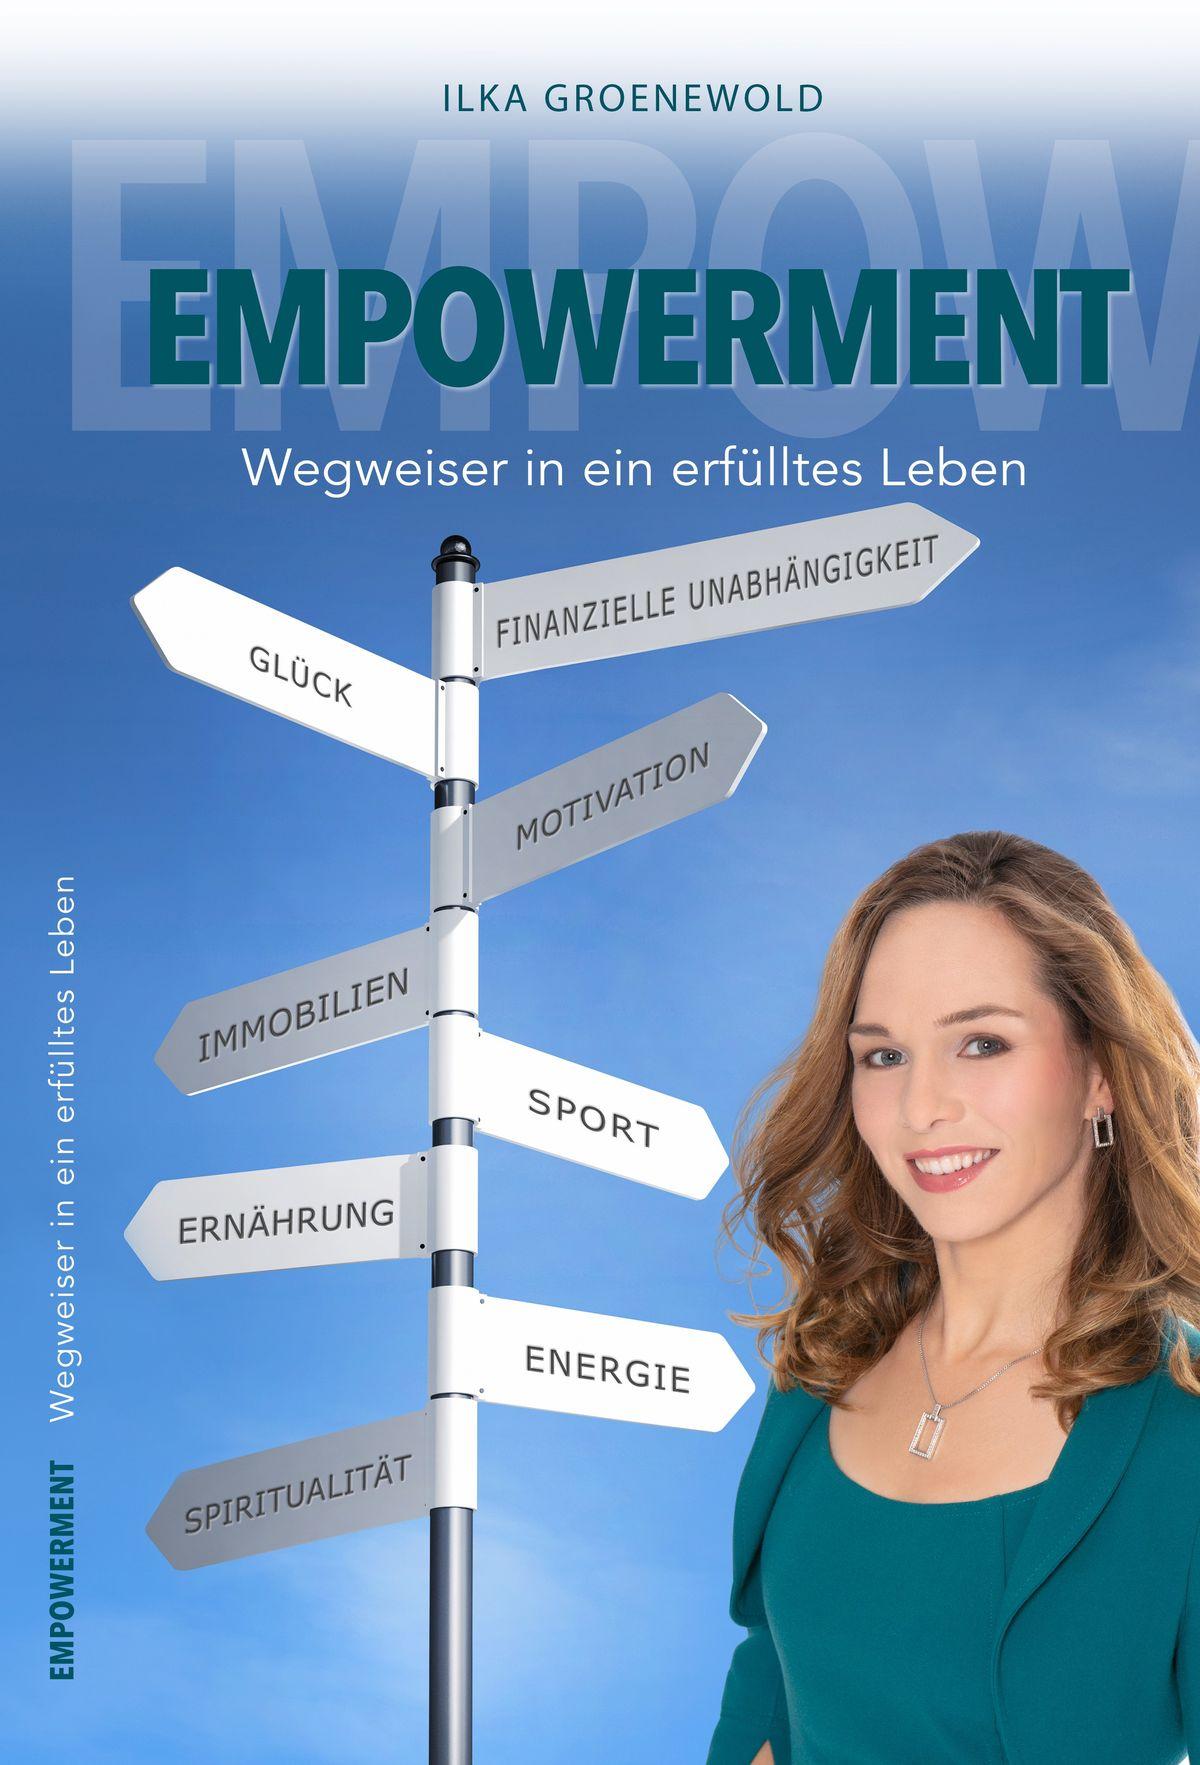 Ilka Groenewold | Empowerment - Wegweiser in ein erfülltes Leben Buch | ISBN 979-8-66556-479-1 | 19,95 Euro Kindle eBook | ASIN B08GJBY3SZ | 9,99 Euro